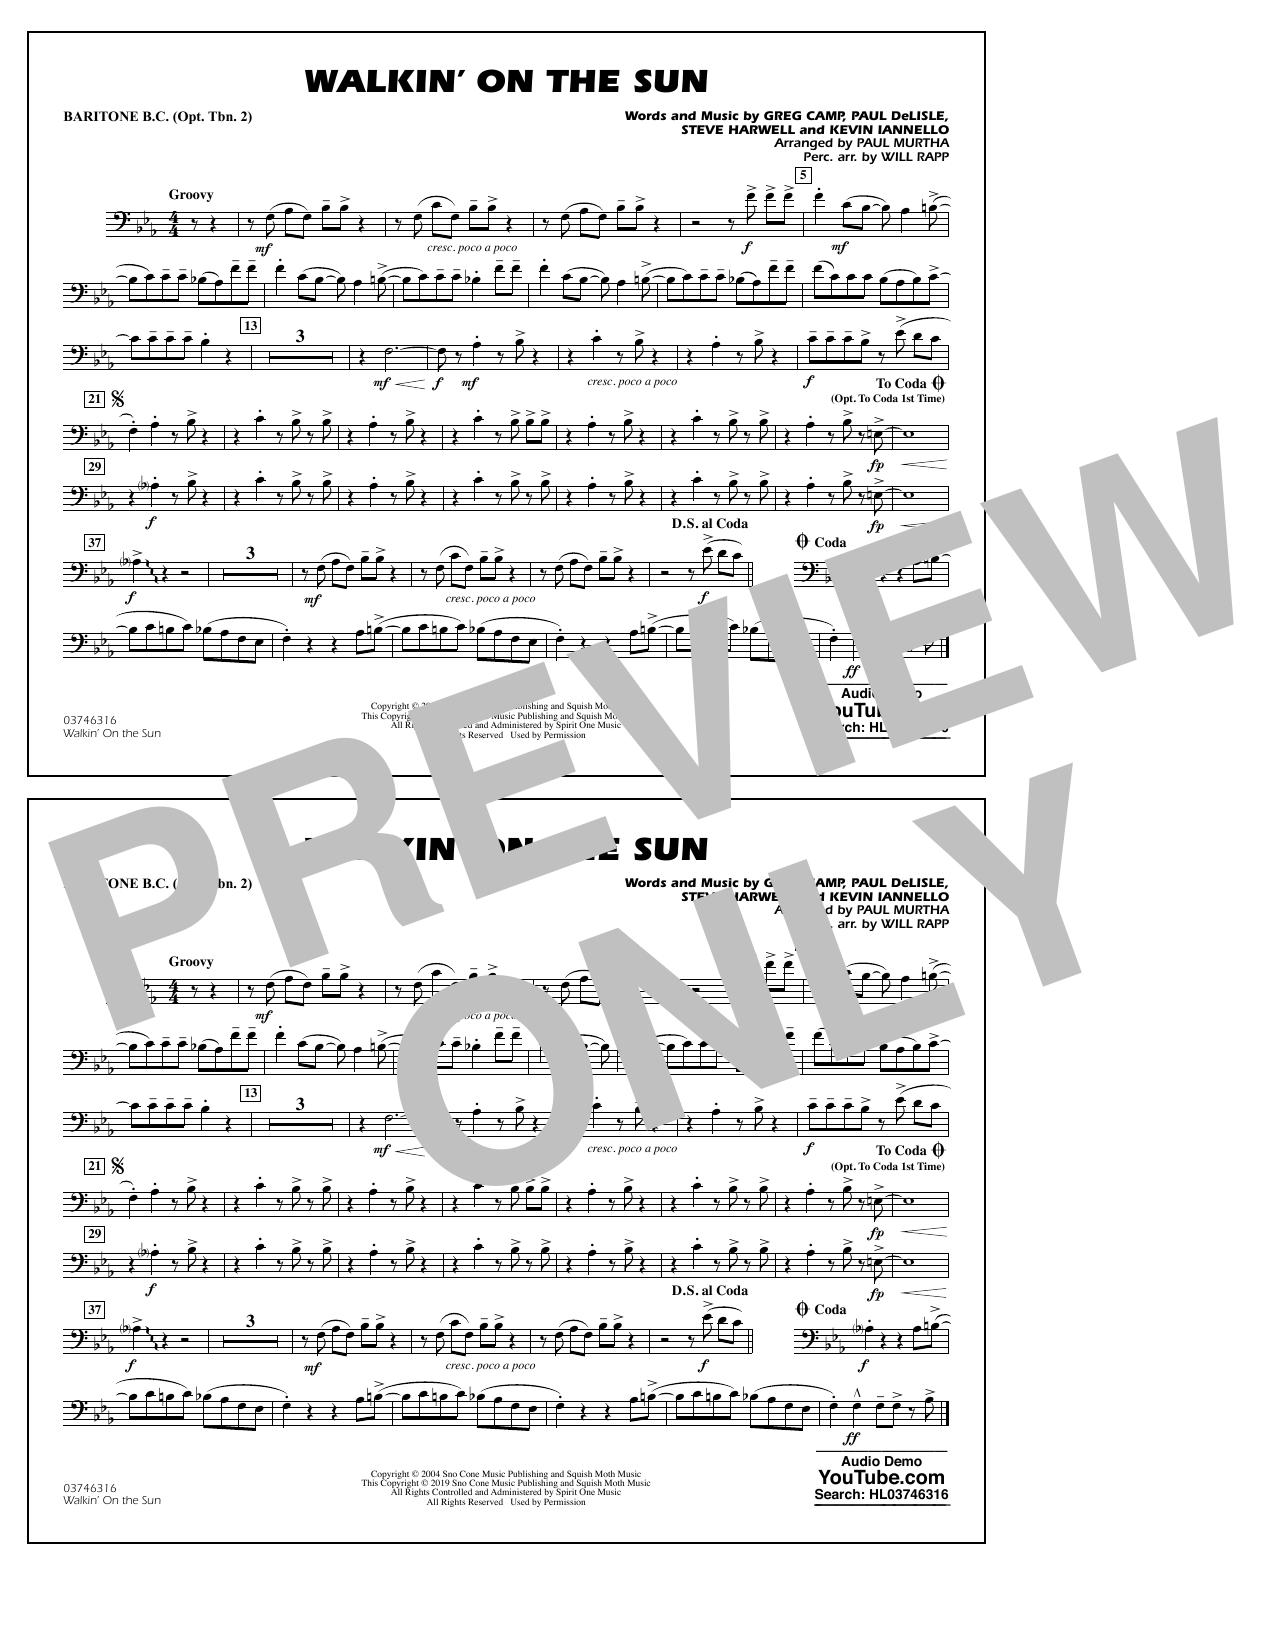 Walkin' on the Sun (arr. Paul Murtha) - Baritone B.C. (Opt. Tbn. 2) (Marching Band)